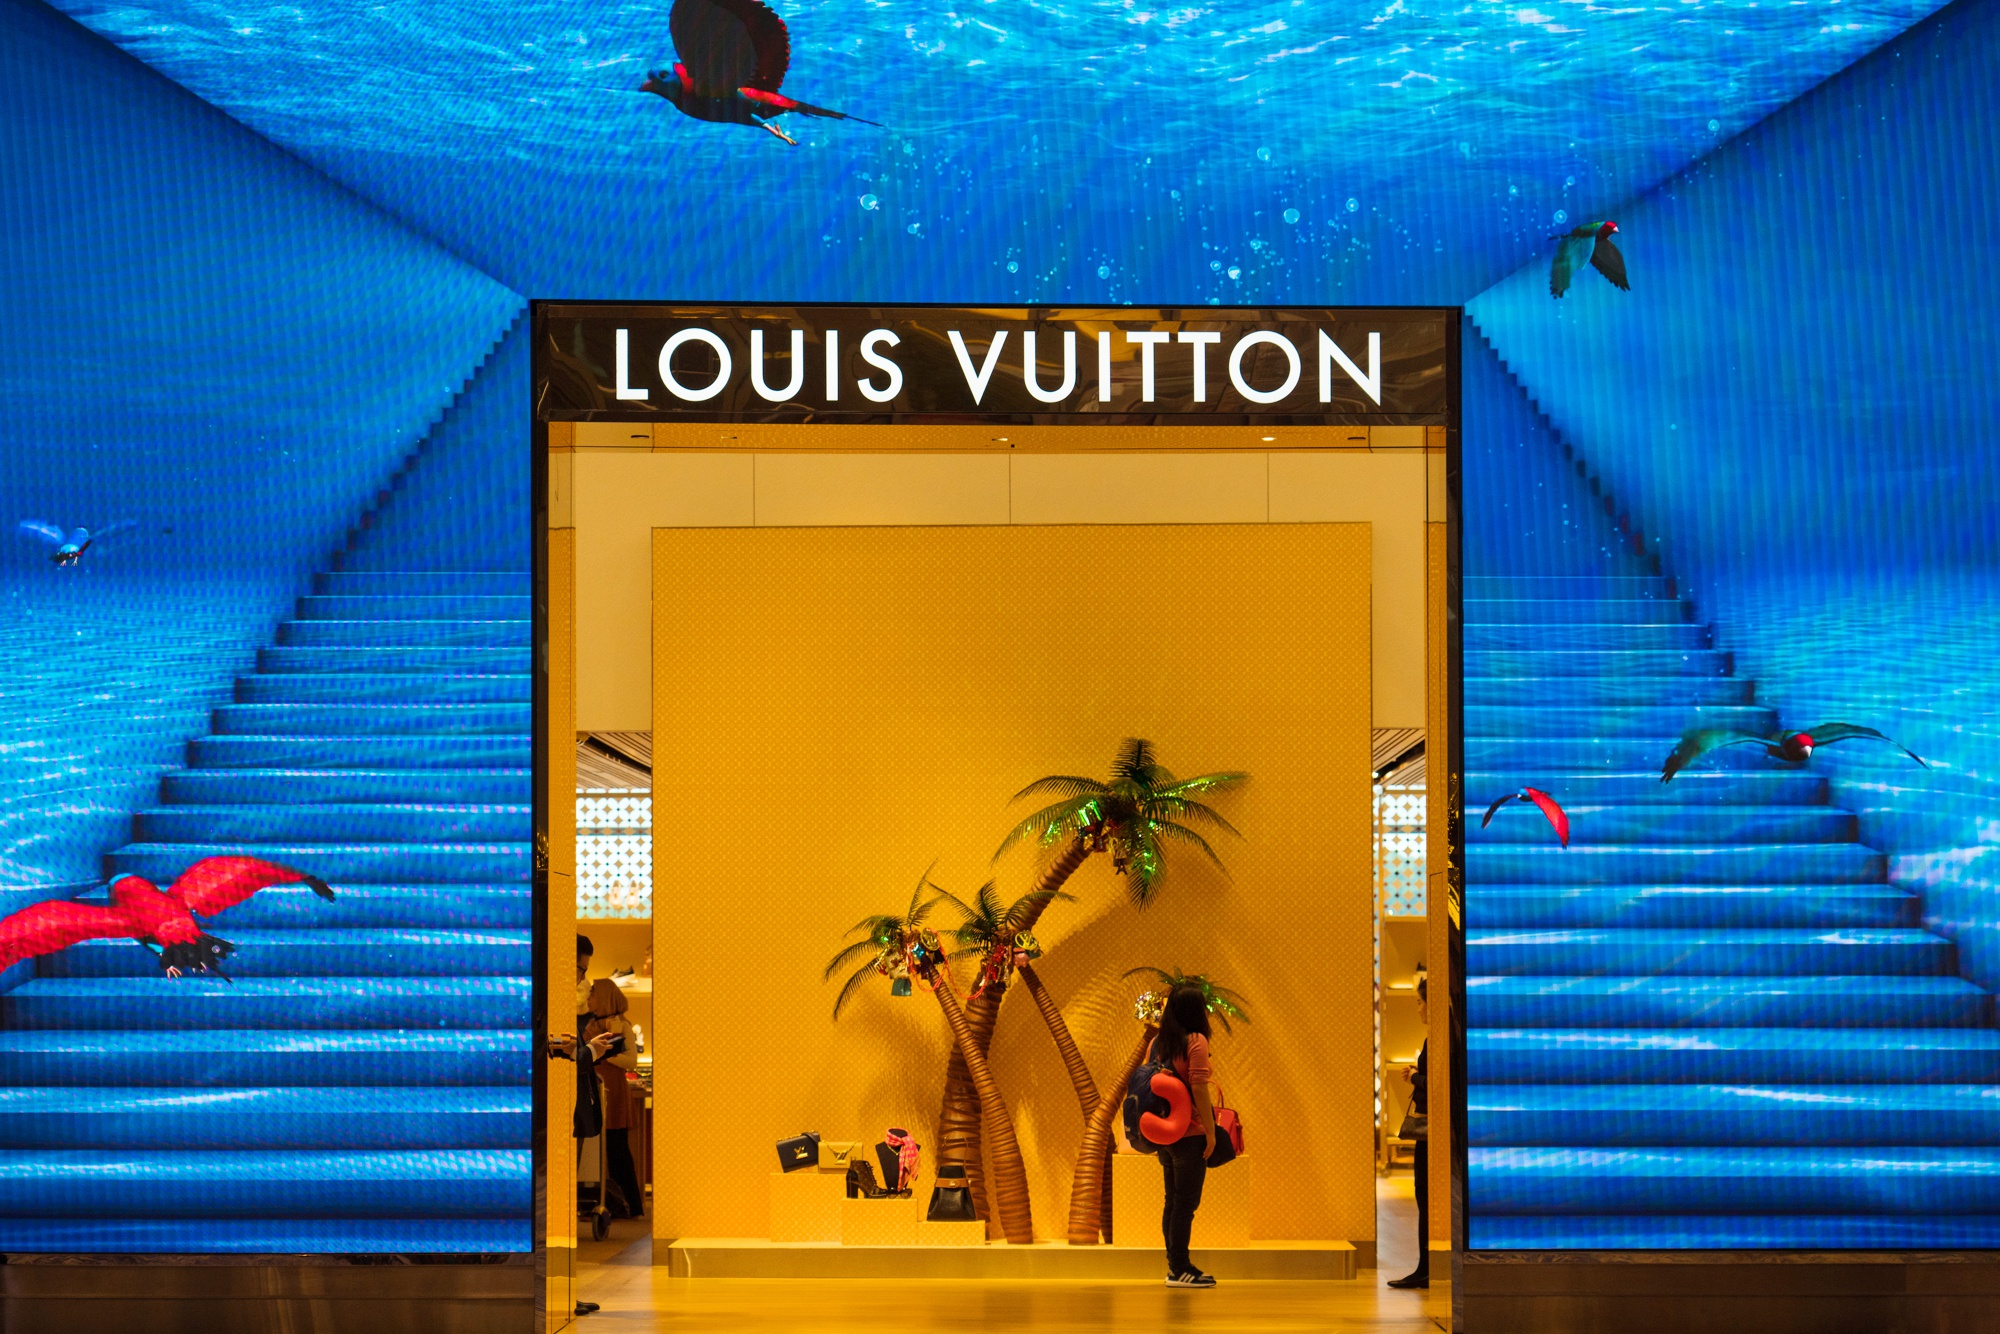 93859fc293b How Much Is Bernard Arnault Worth? LVMH Sales Beat - Bloomberg